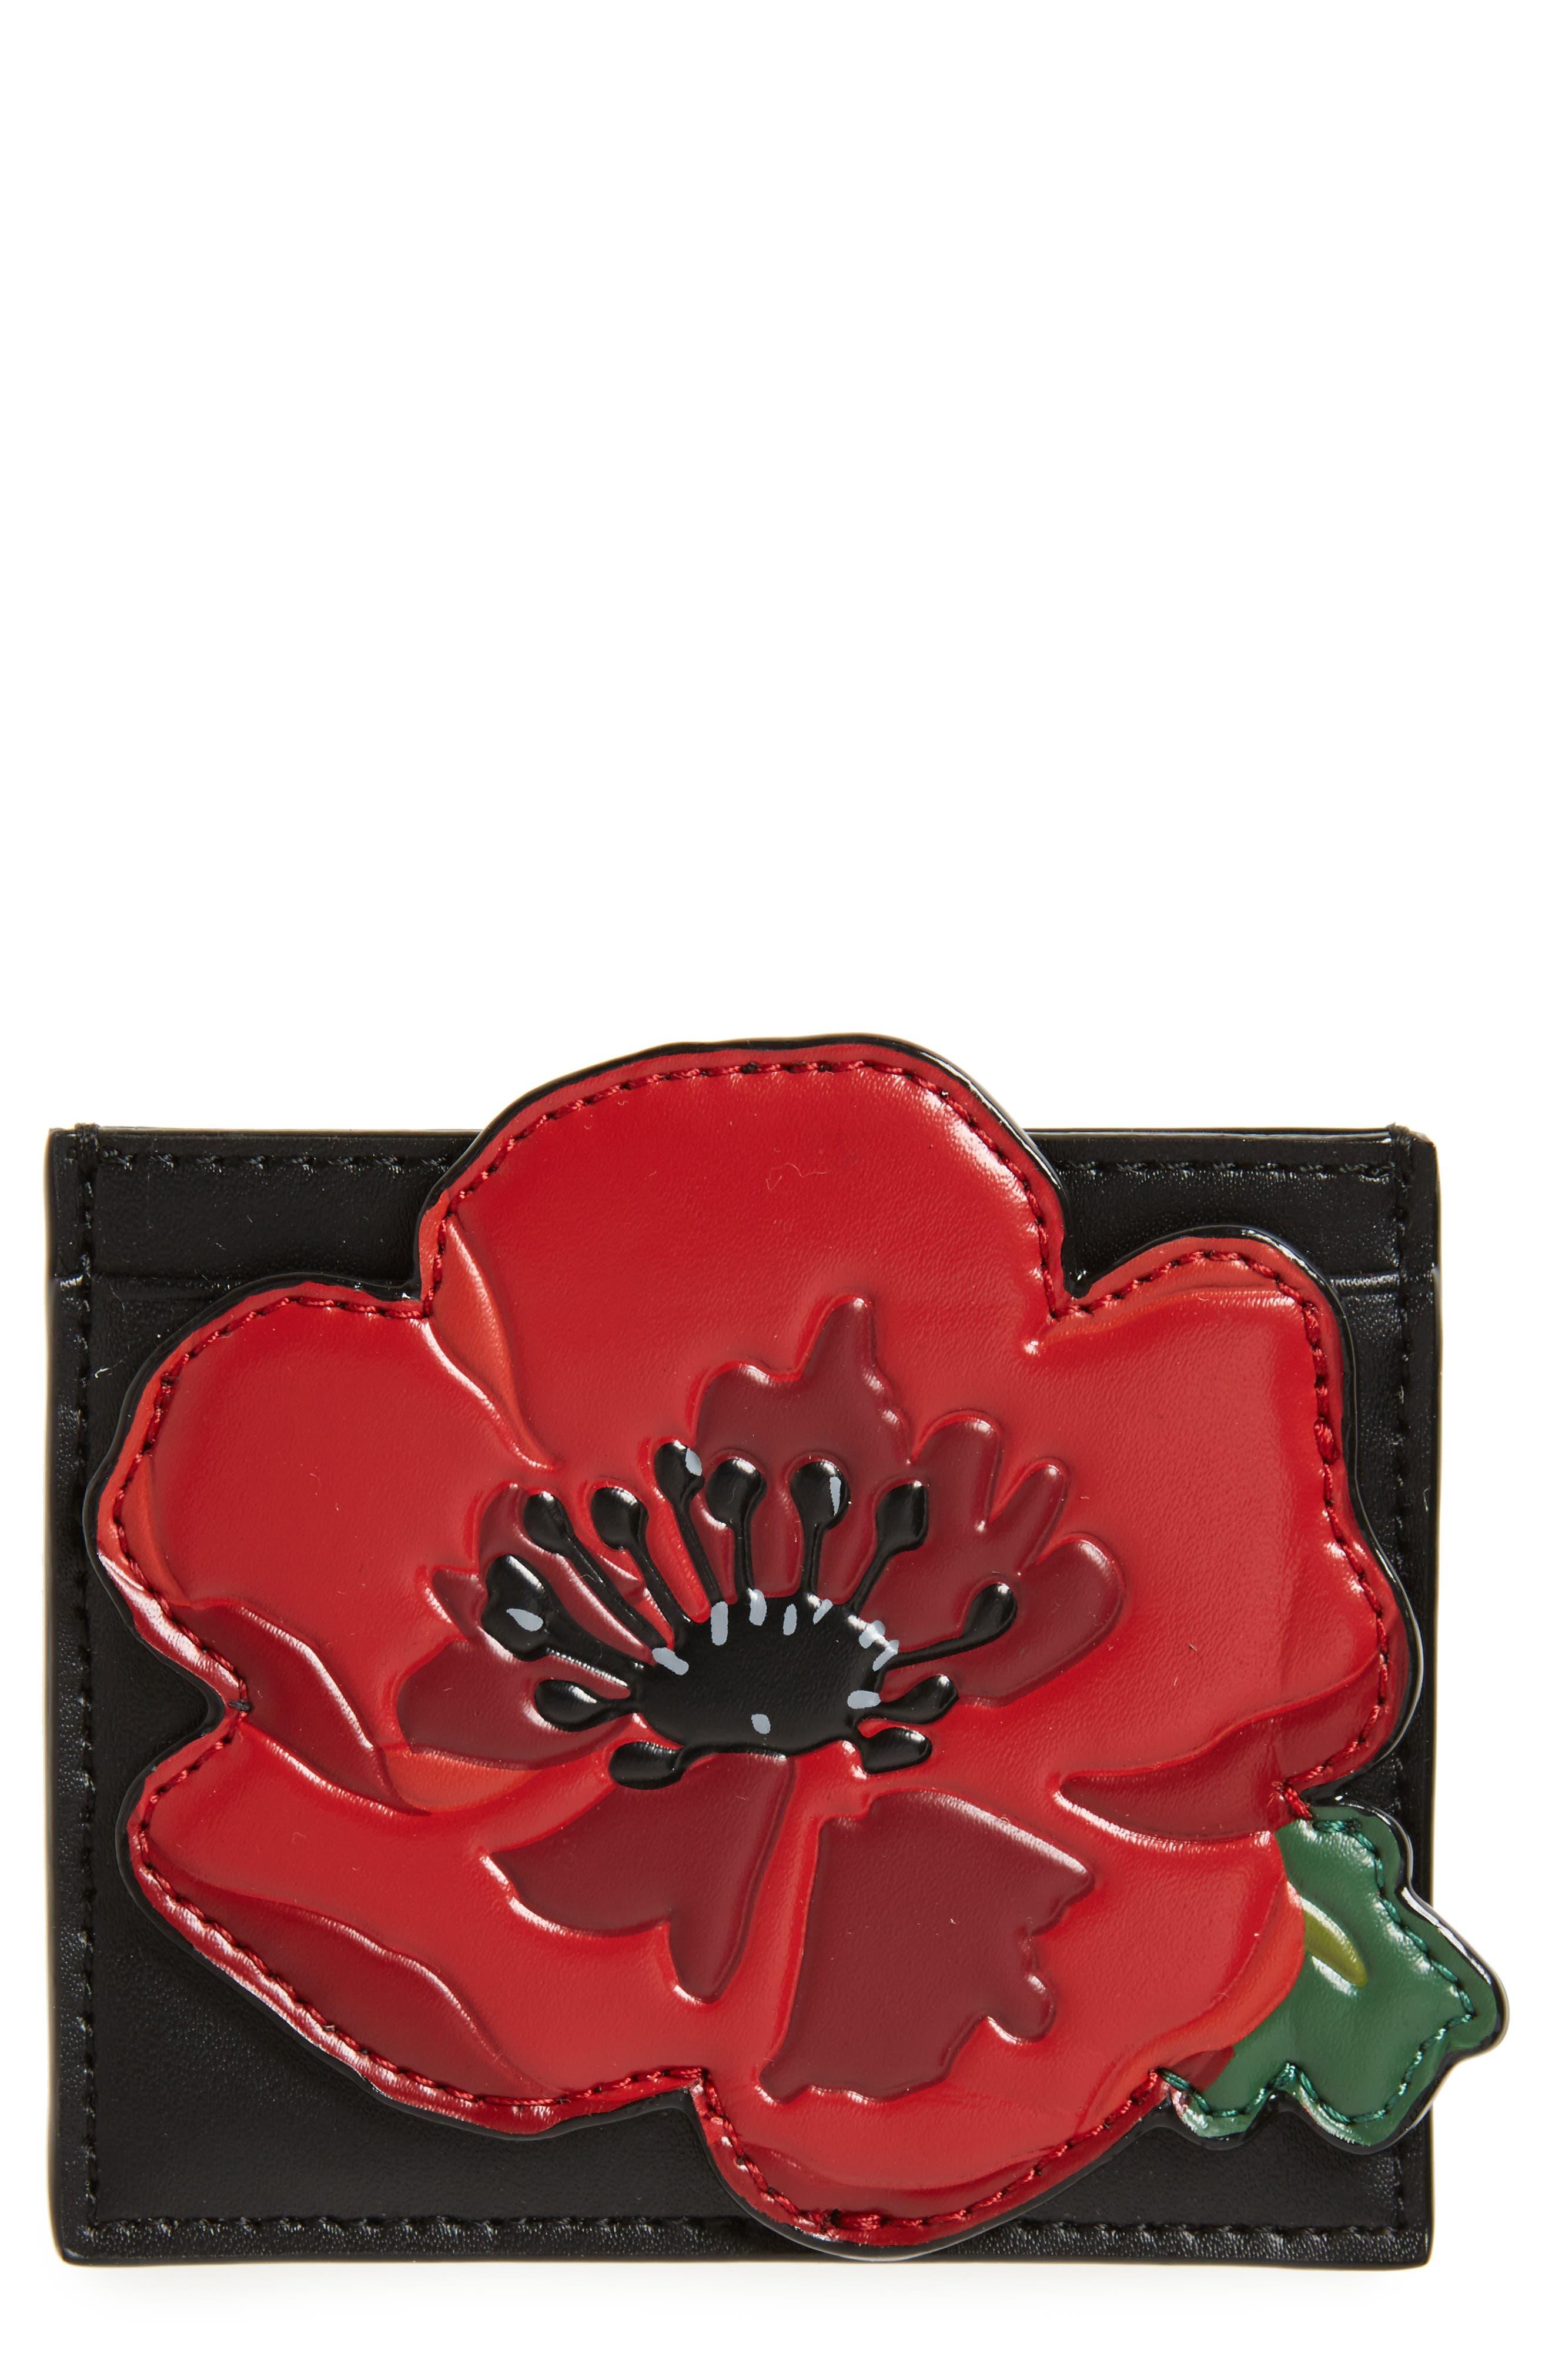 Main Image - kate spade new york ooh la la poppy leather card holder kate